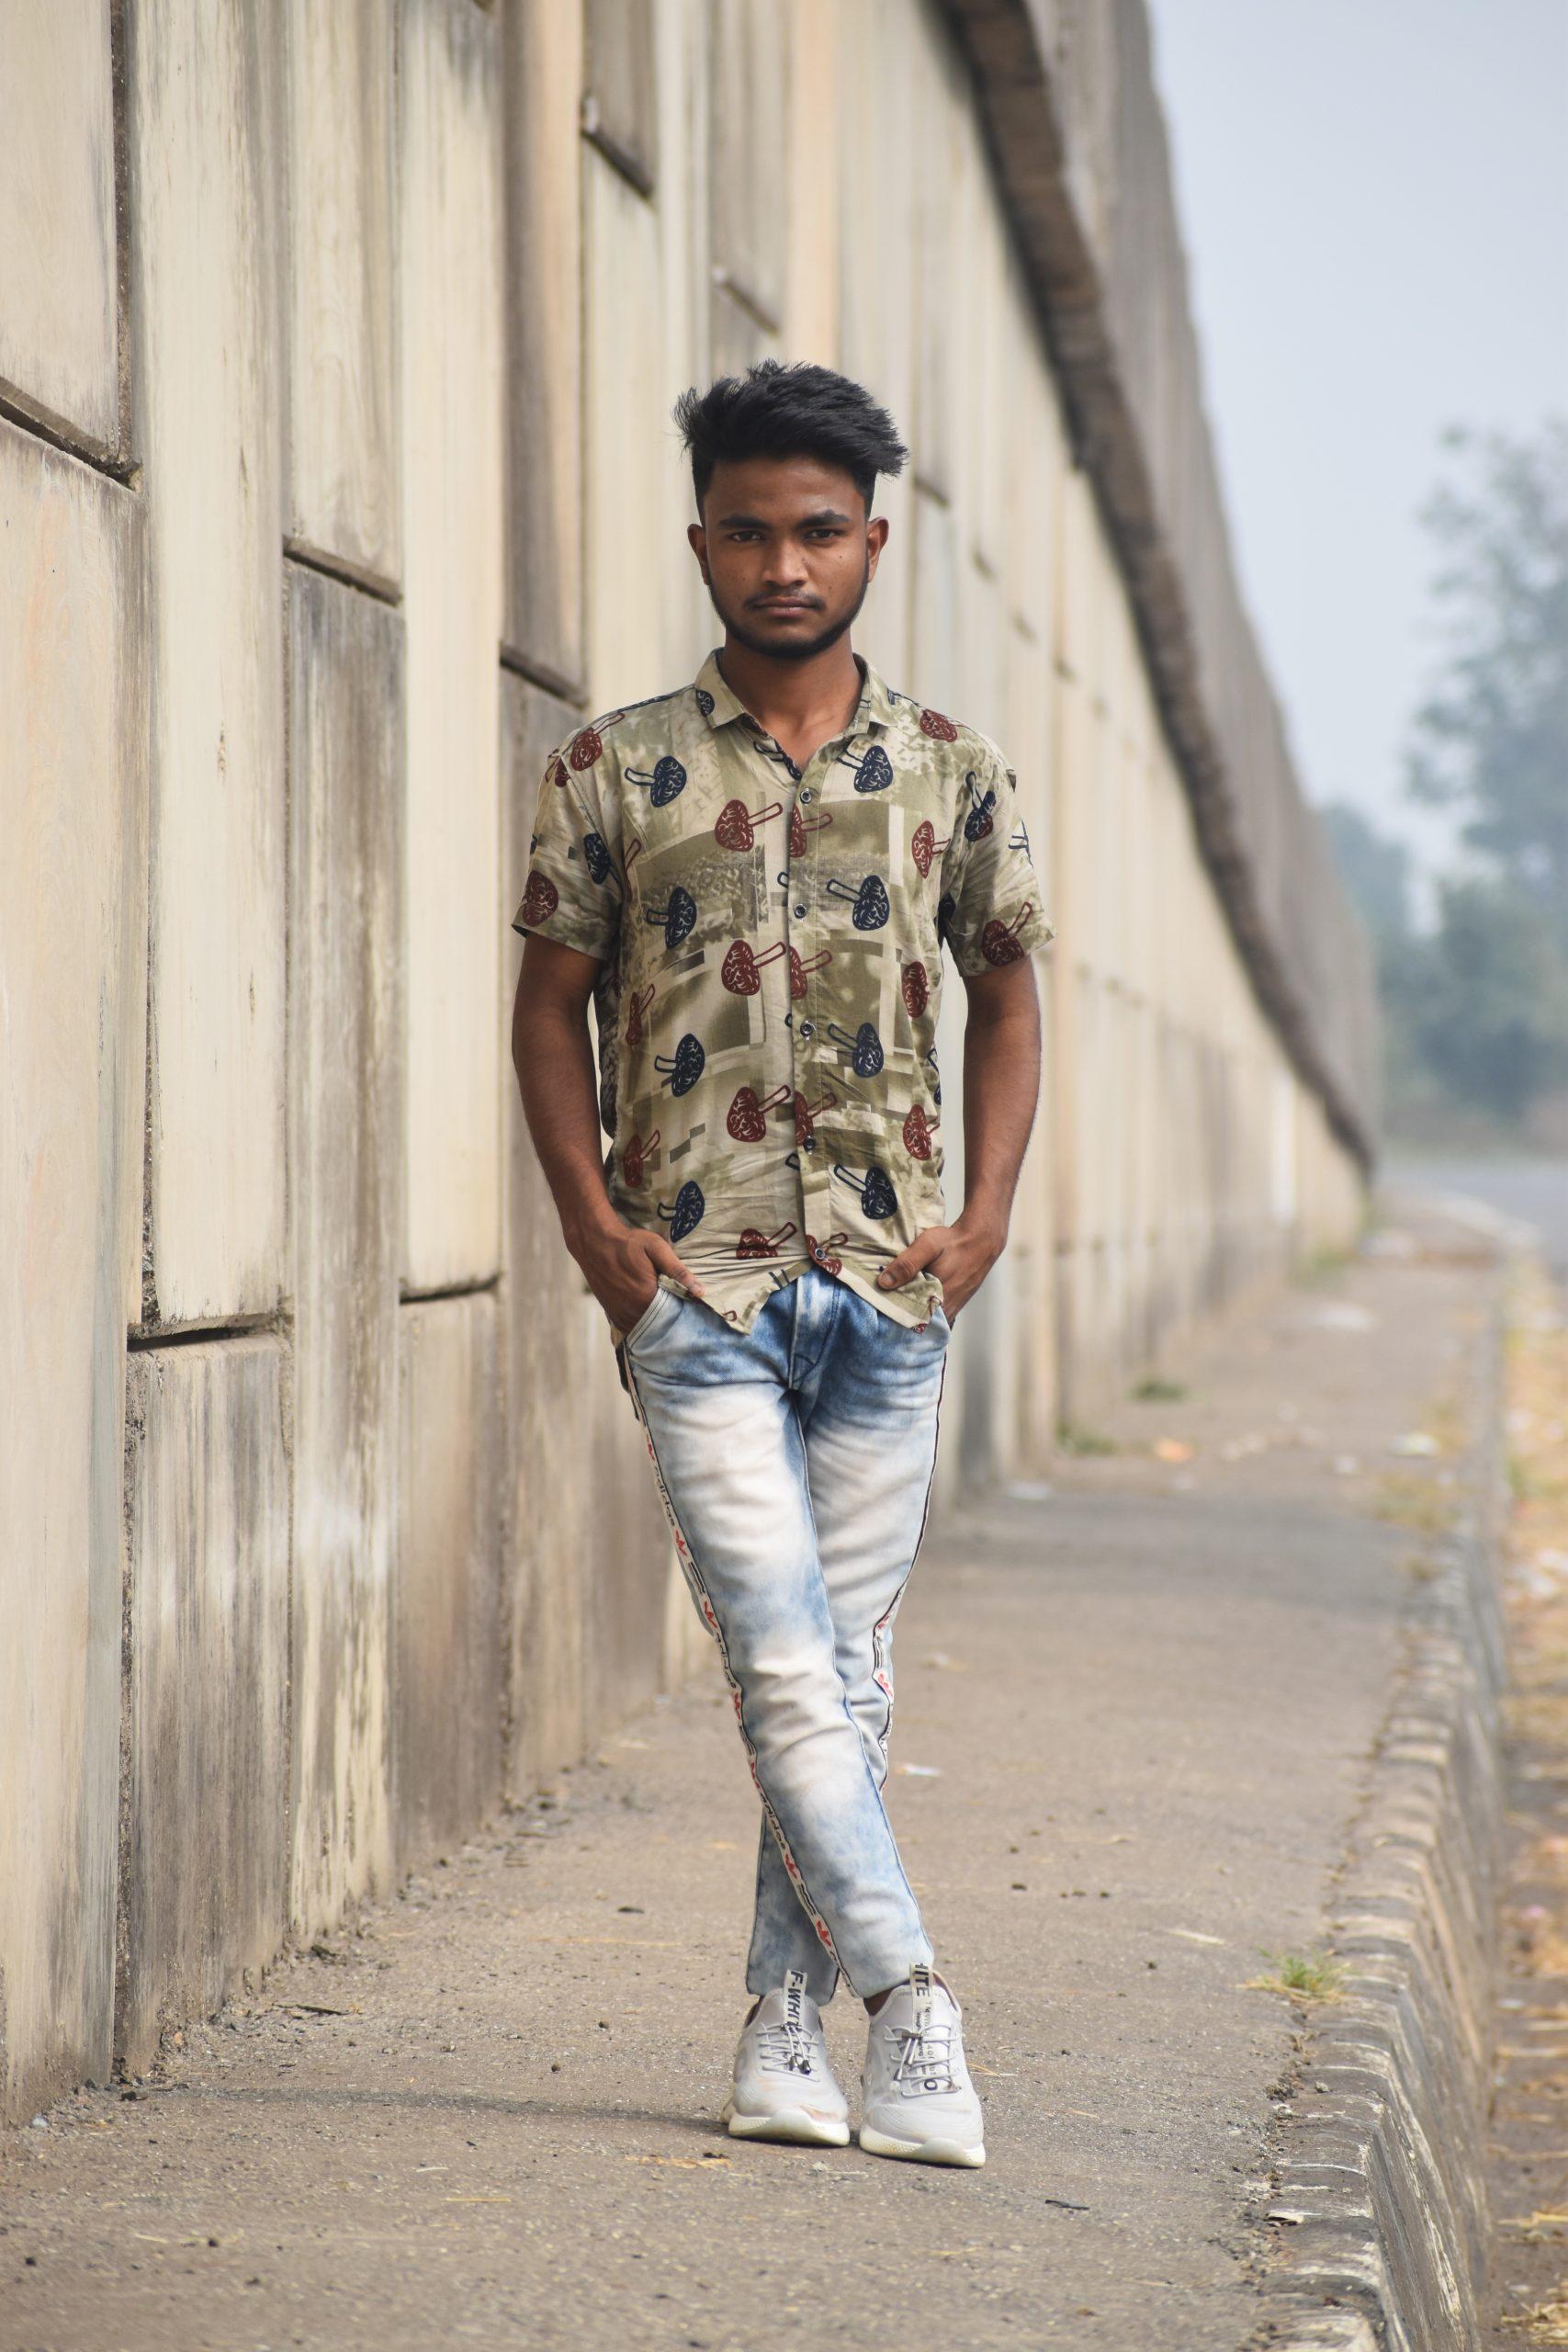 Boy posing Road side